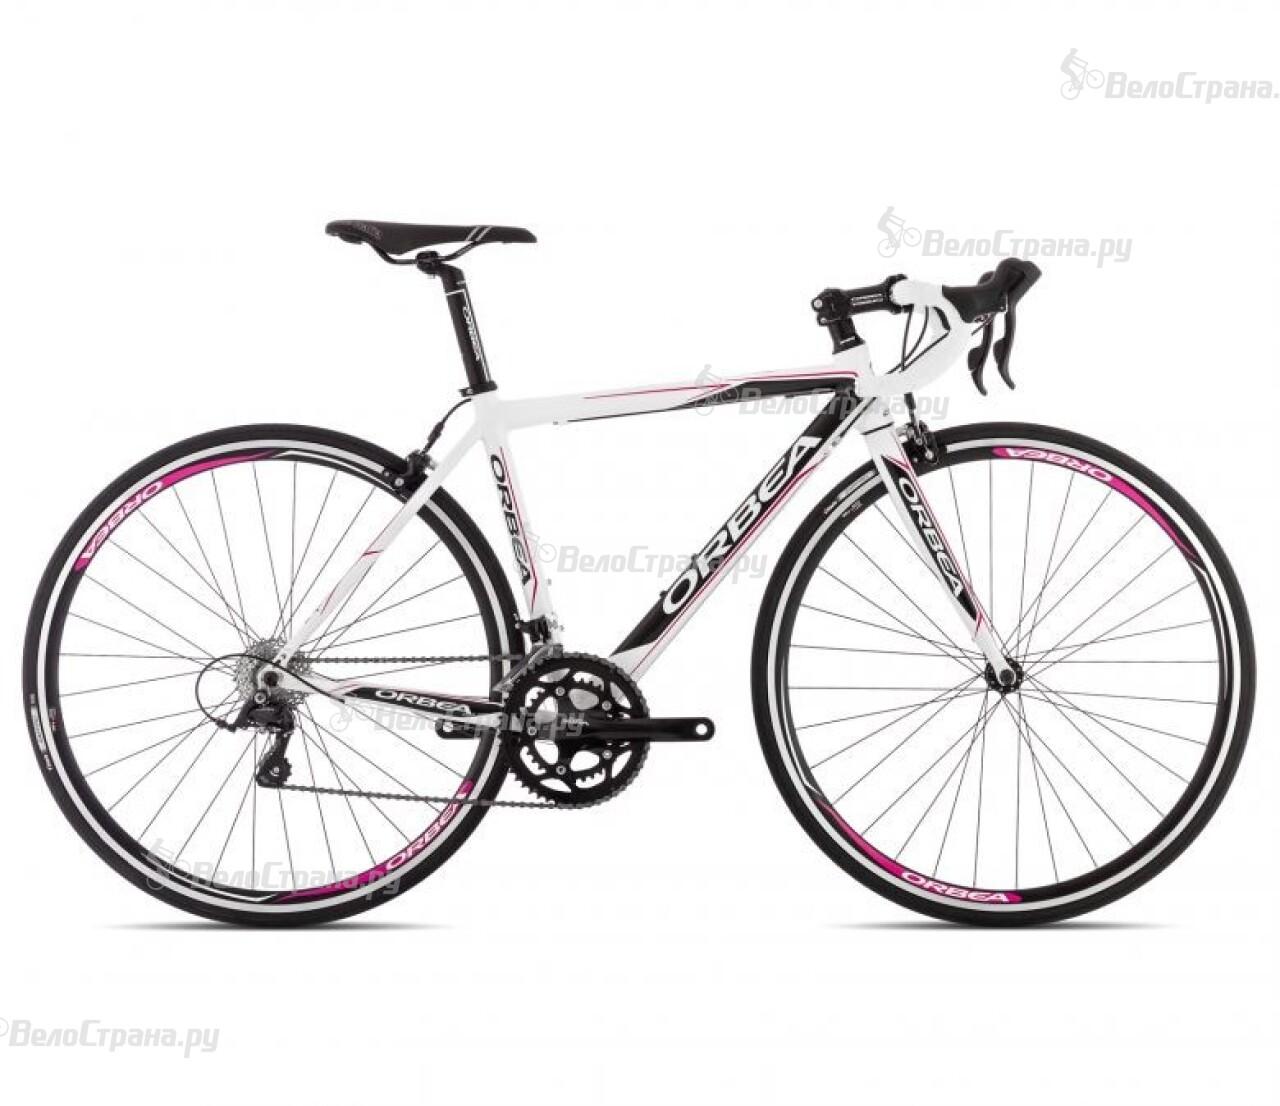 Велосипед Orbea Aqua Dama 30 (2014) велосипед orbea aqua t23 2013